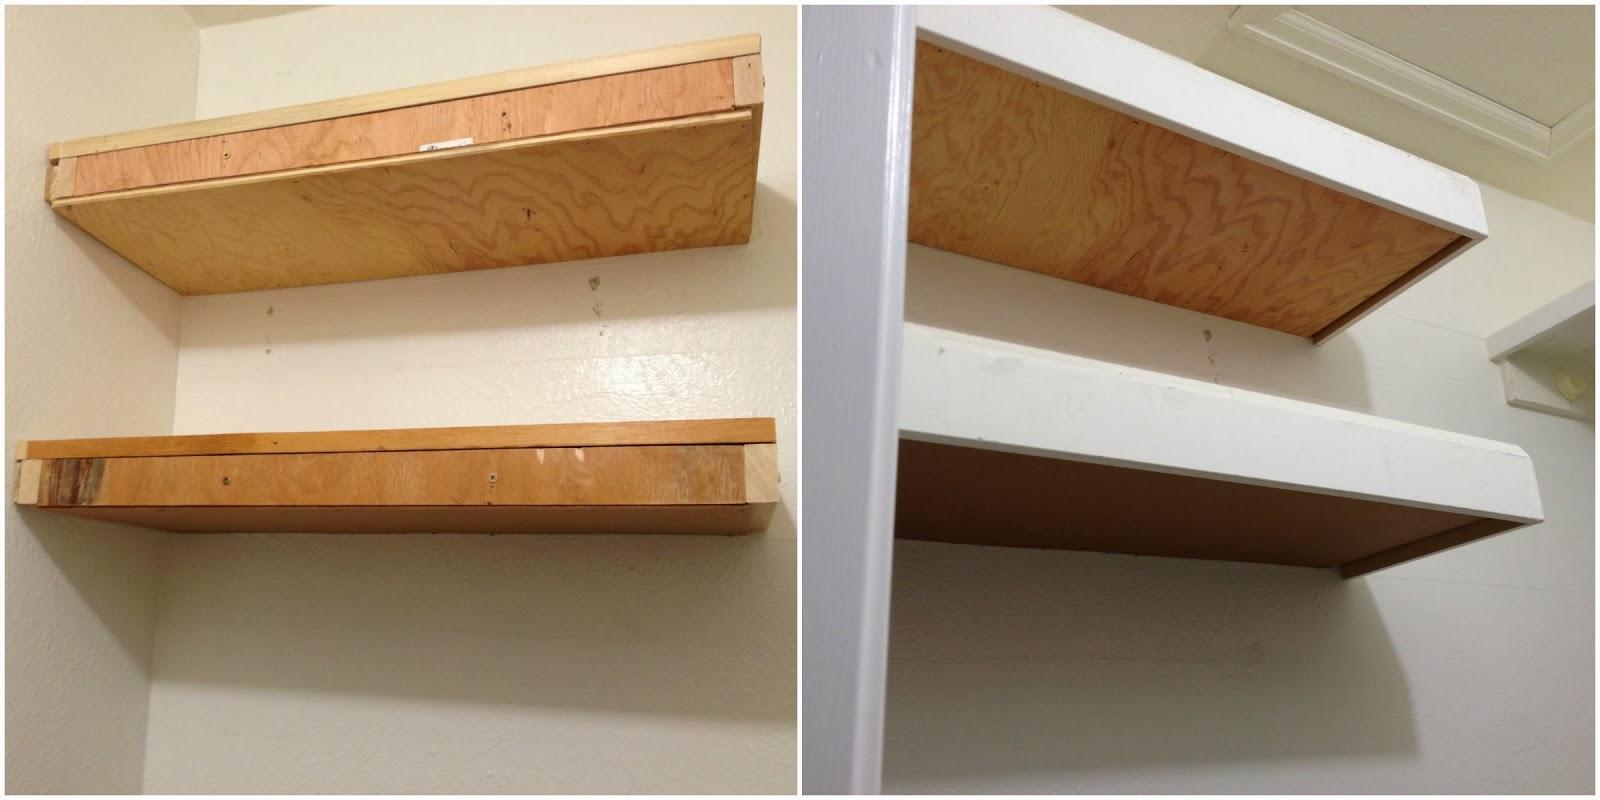 Shoe Shelf Bench And Floating Shelves Master Closet